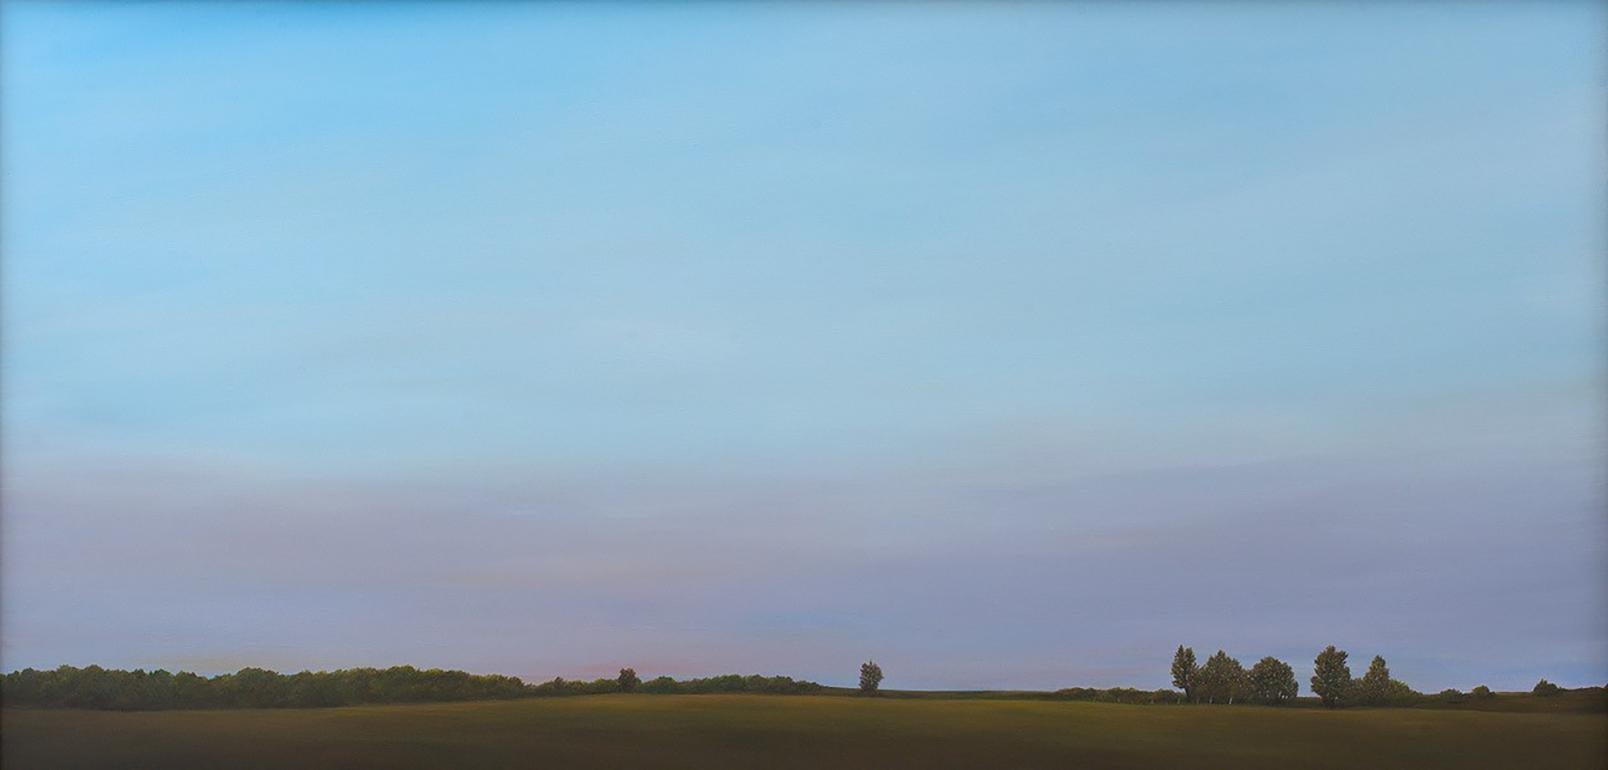 Morning Light, North of Springfield -  Serene Landscape with Purple Haze, Framed